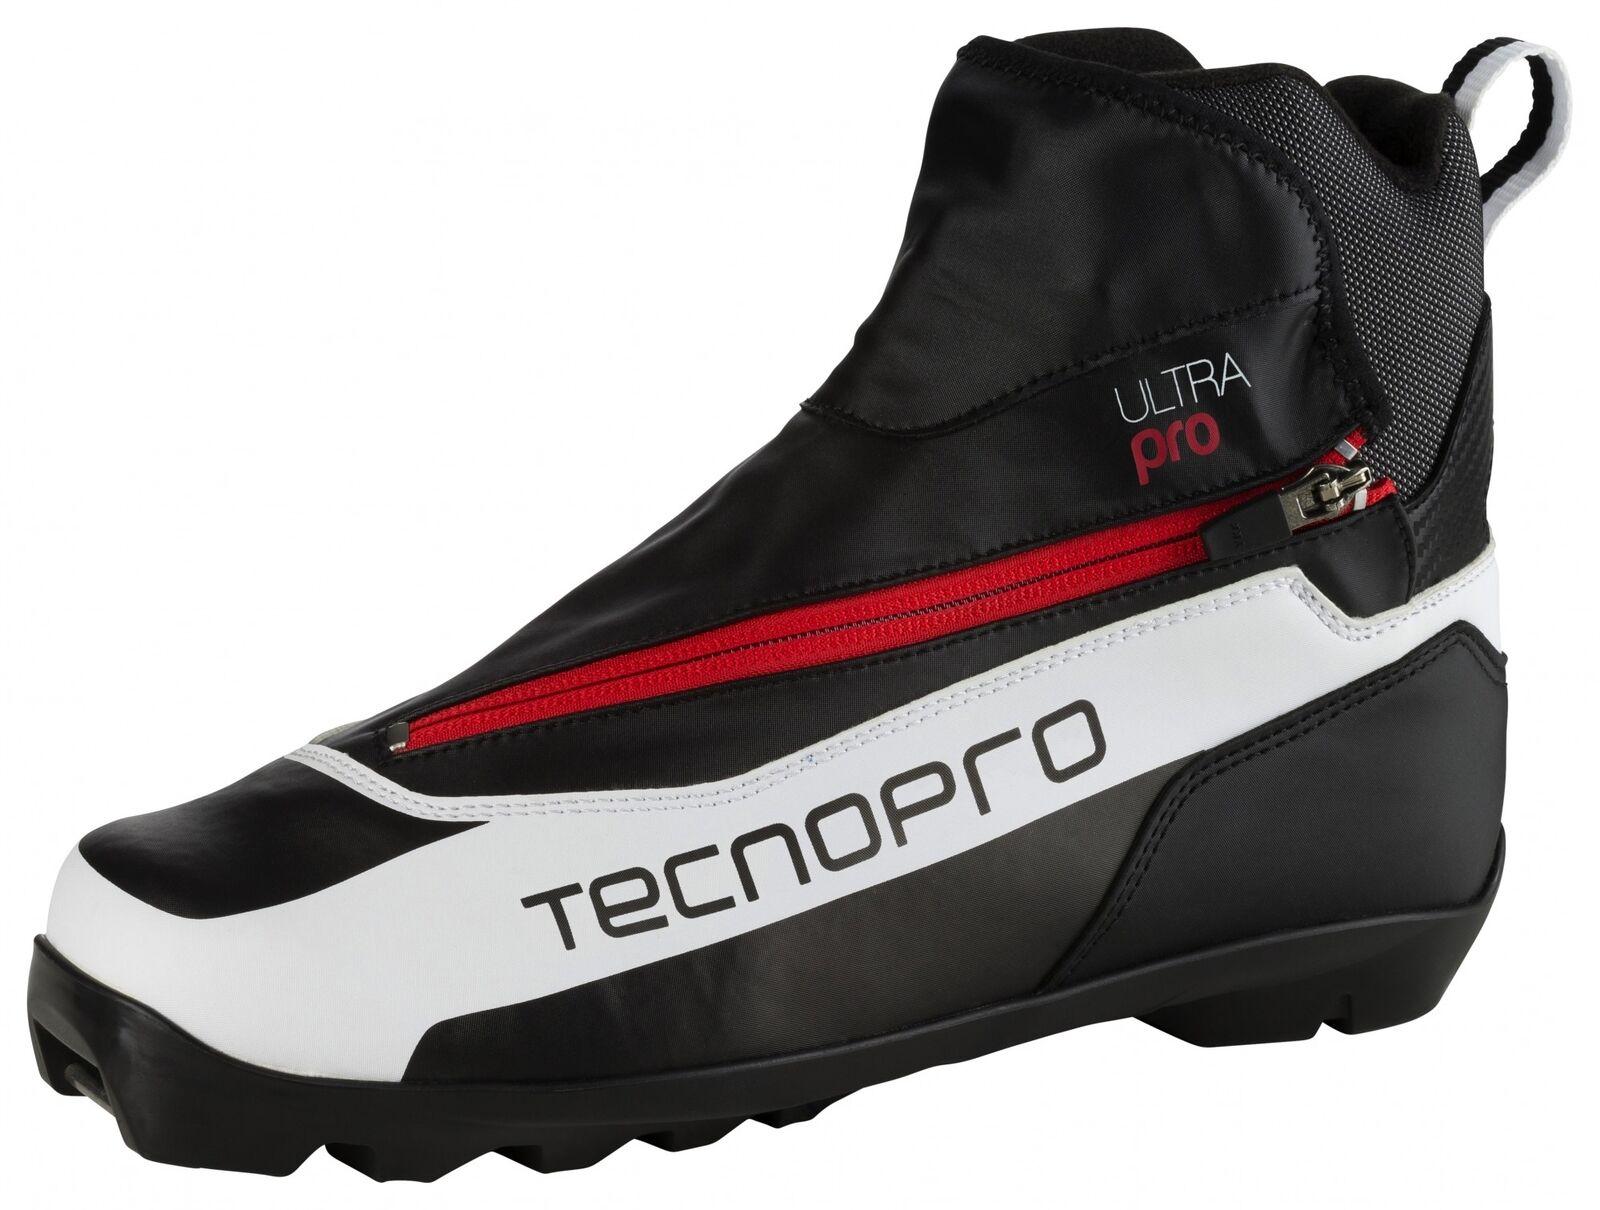 Tecnopro Ll-Zapato Ultra pro Hombre Botín botas Esquí de Fondo Zapato Del